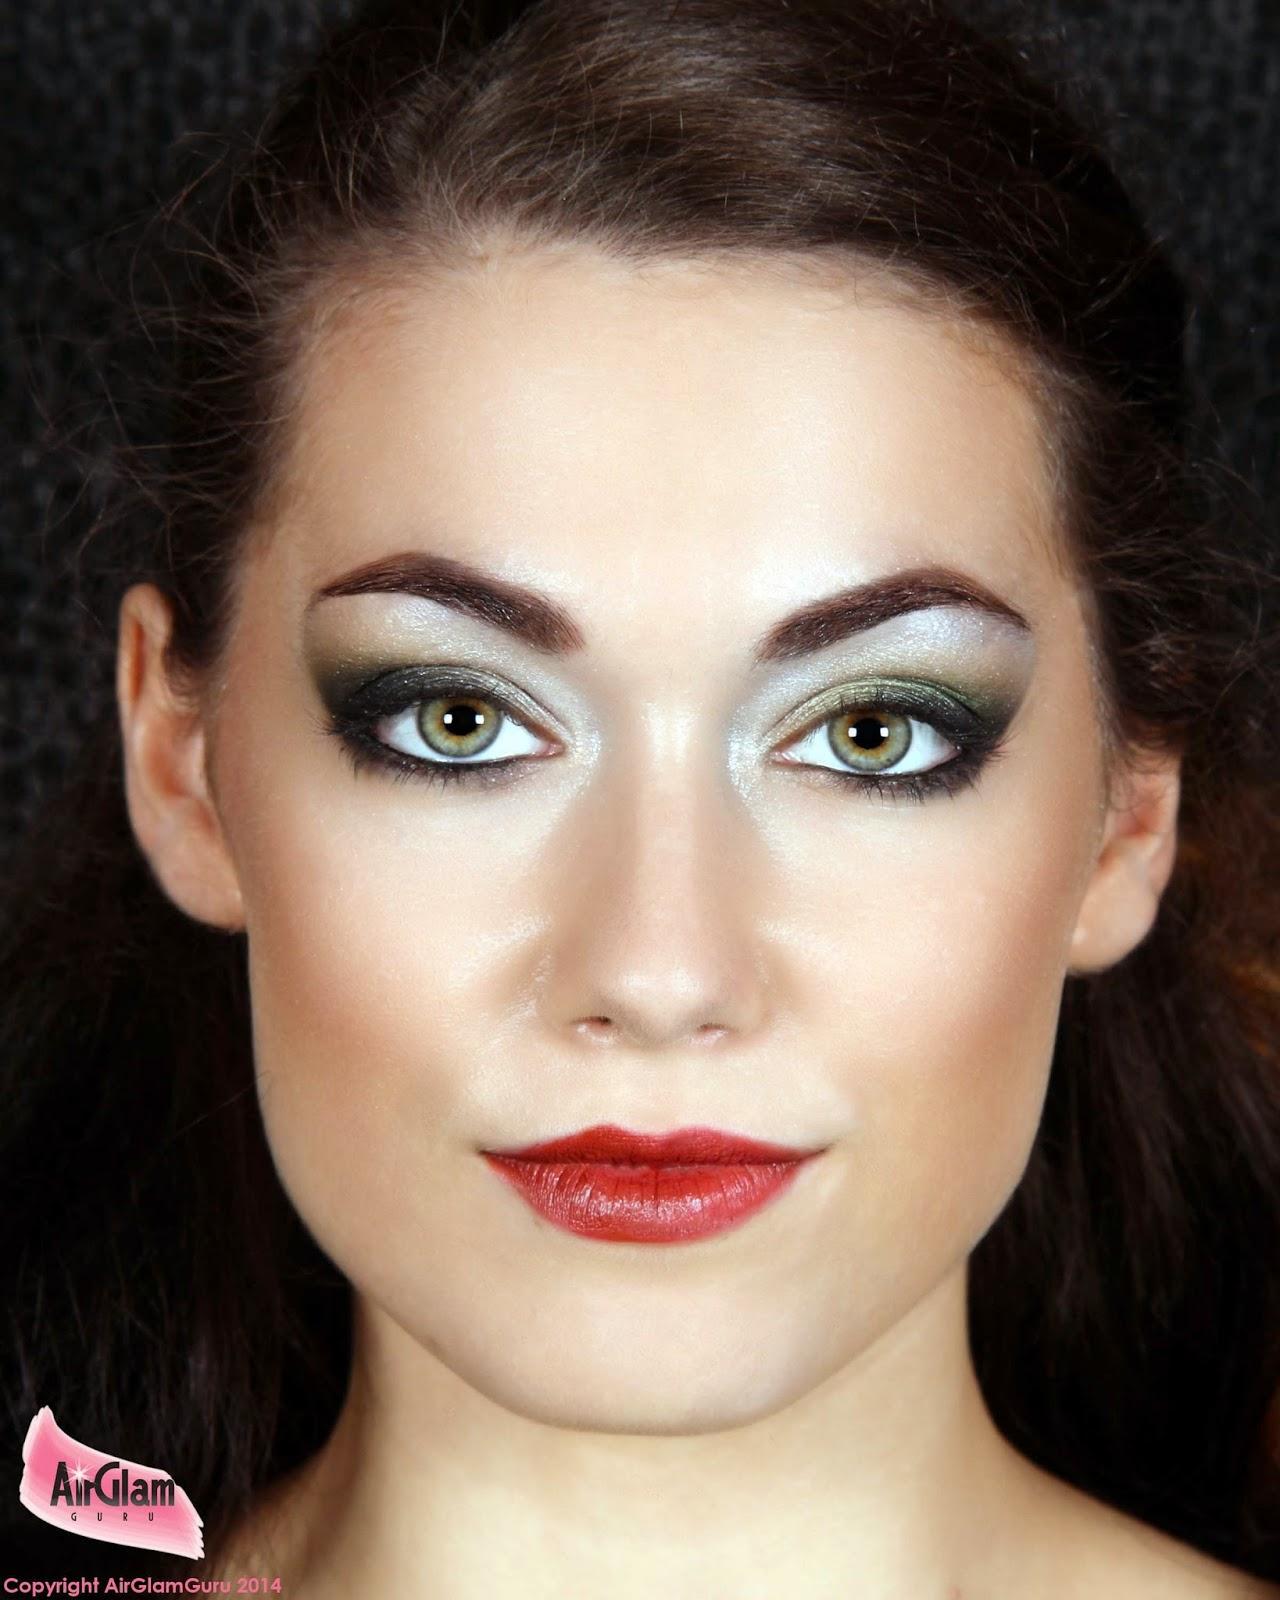 Makeup Gurus On Youtube: The Airbrush Makeup Guru: Airbrush Makeup Kit In-depth